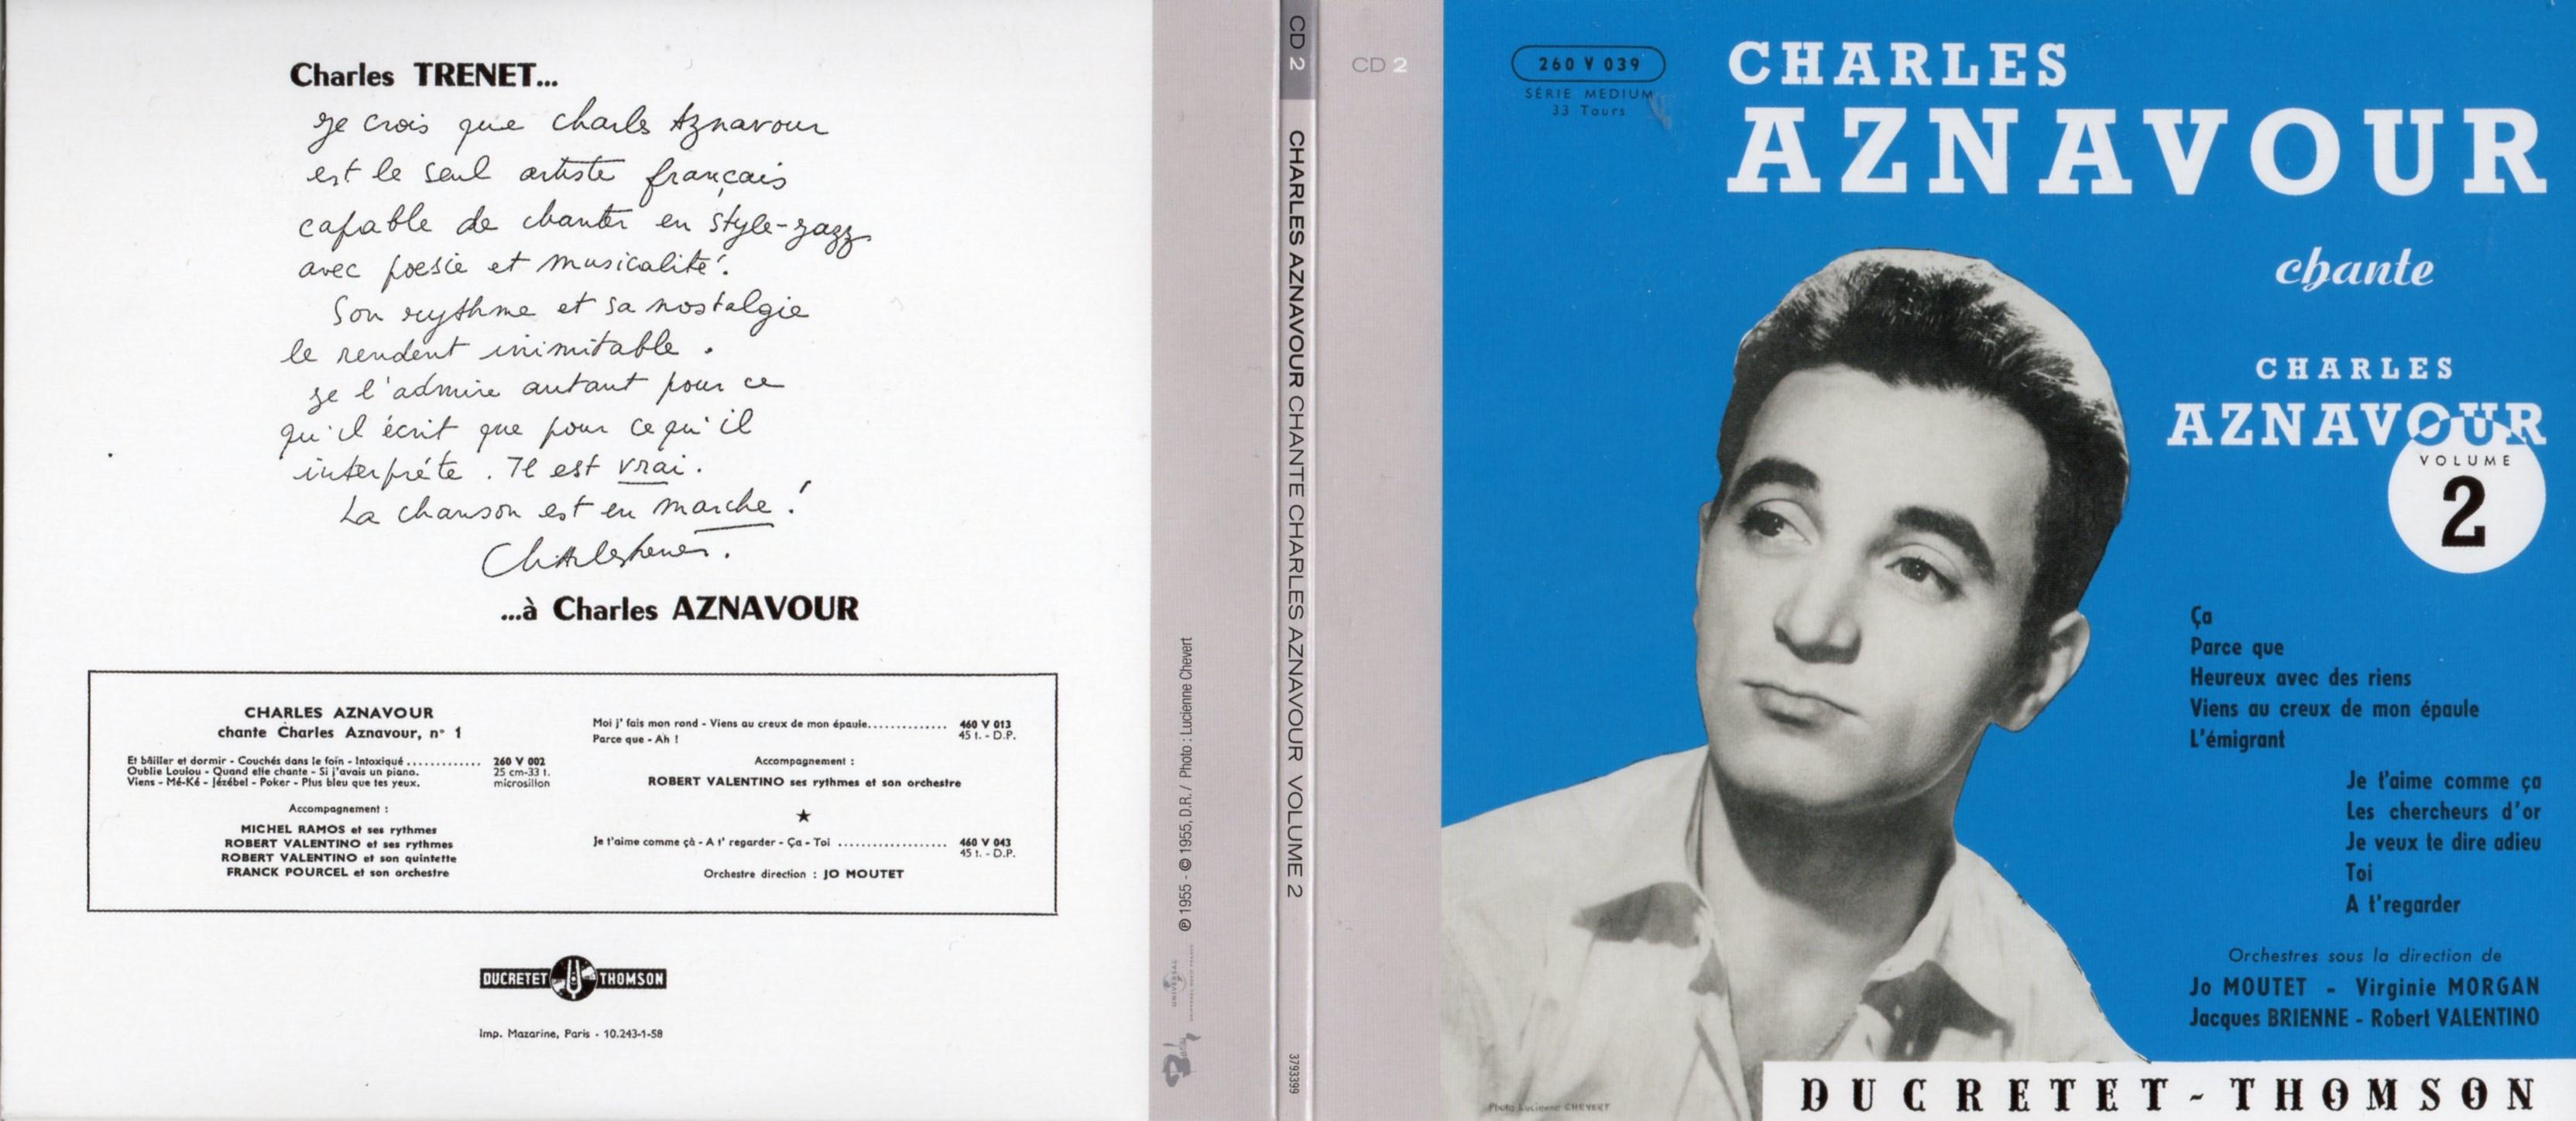 CHARLES AZNAVOUR - Charles Aznavour Chante vol 2 ... (1955) Gatefold Card board REPLICA sleeve - CD